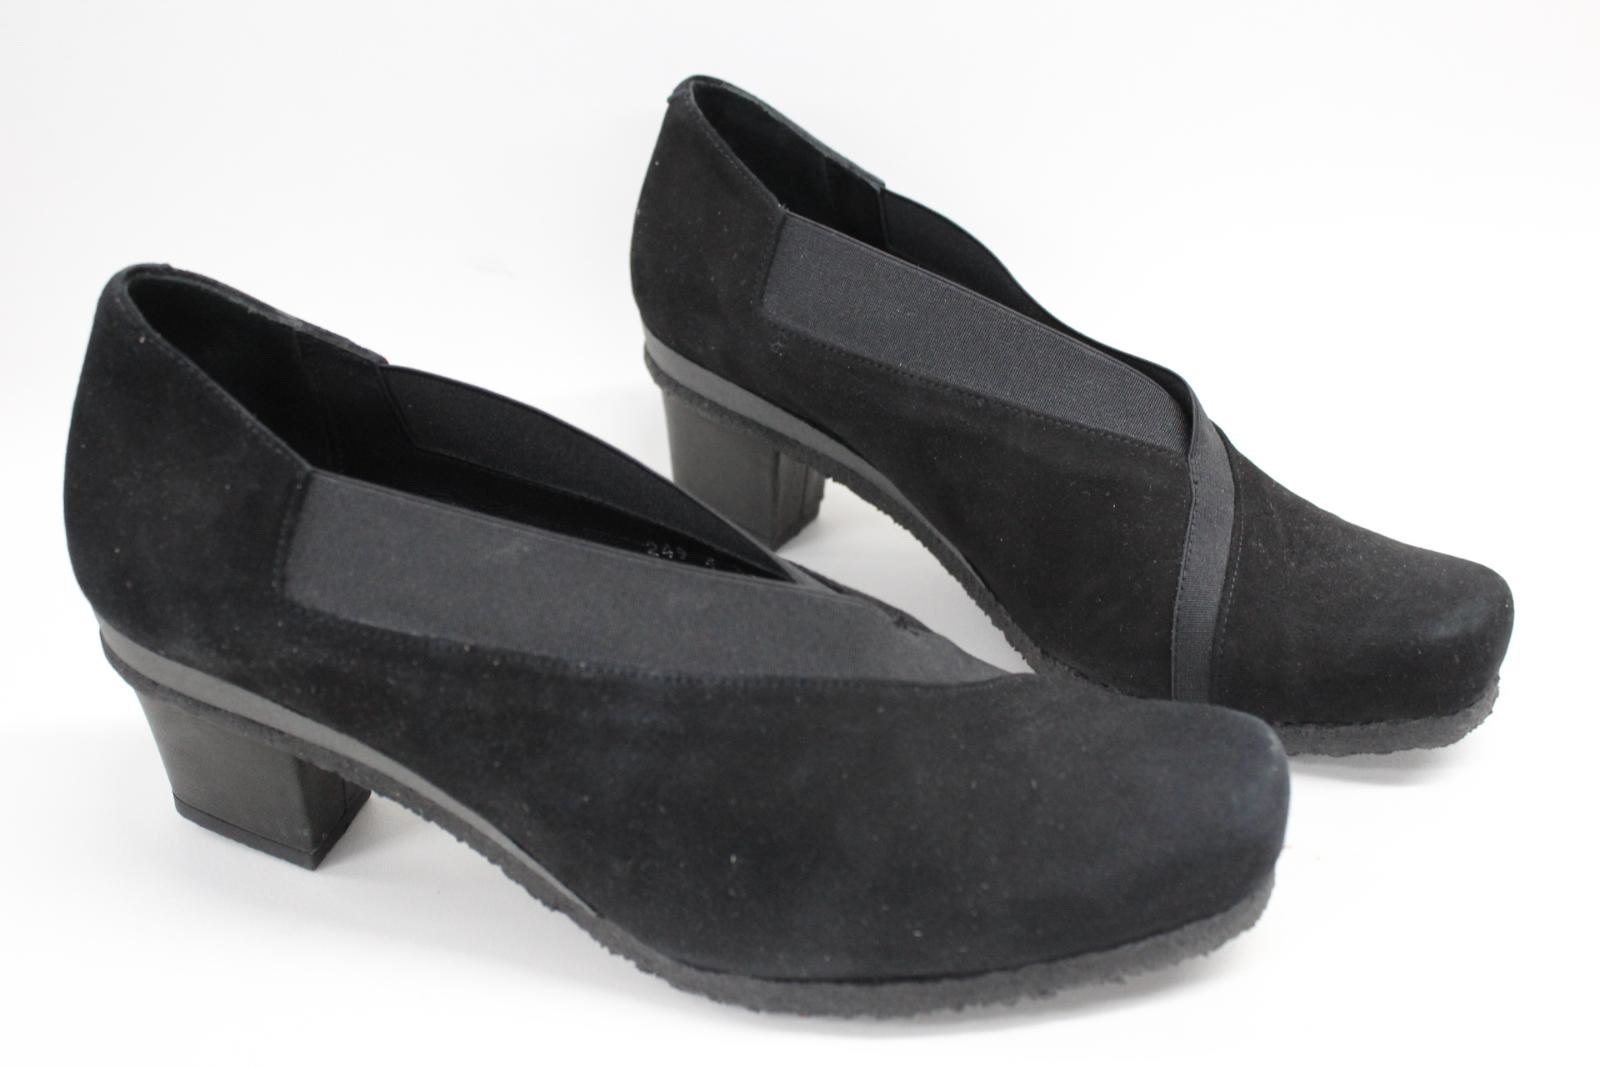 AUDLEY-London-Ladies-Black-Suede-Crossover-Block-Heels-Shoes-Size-EU39-UK6